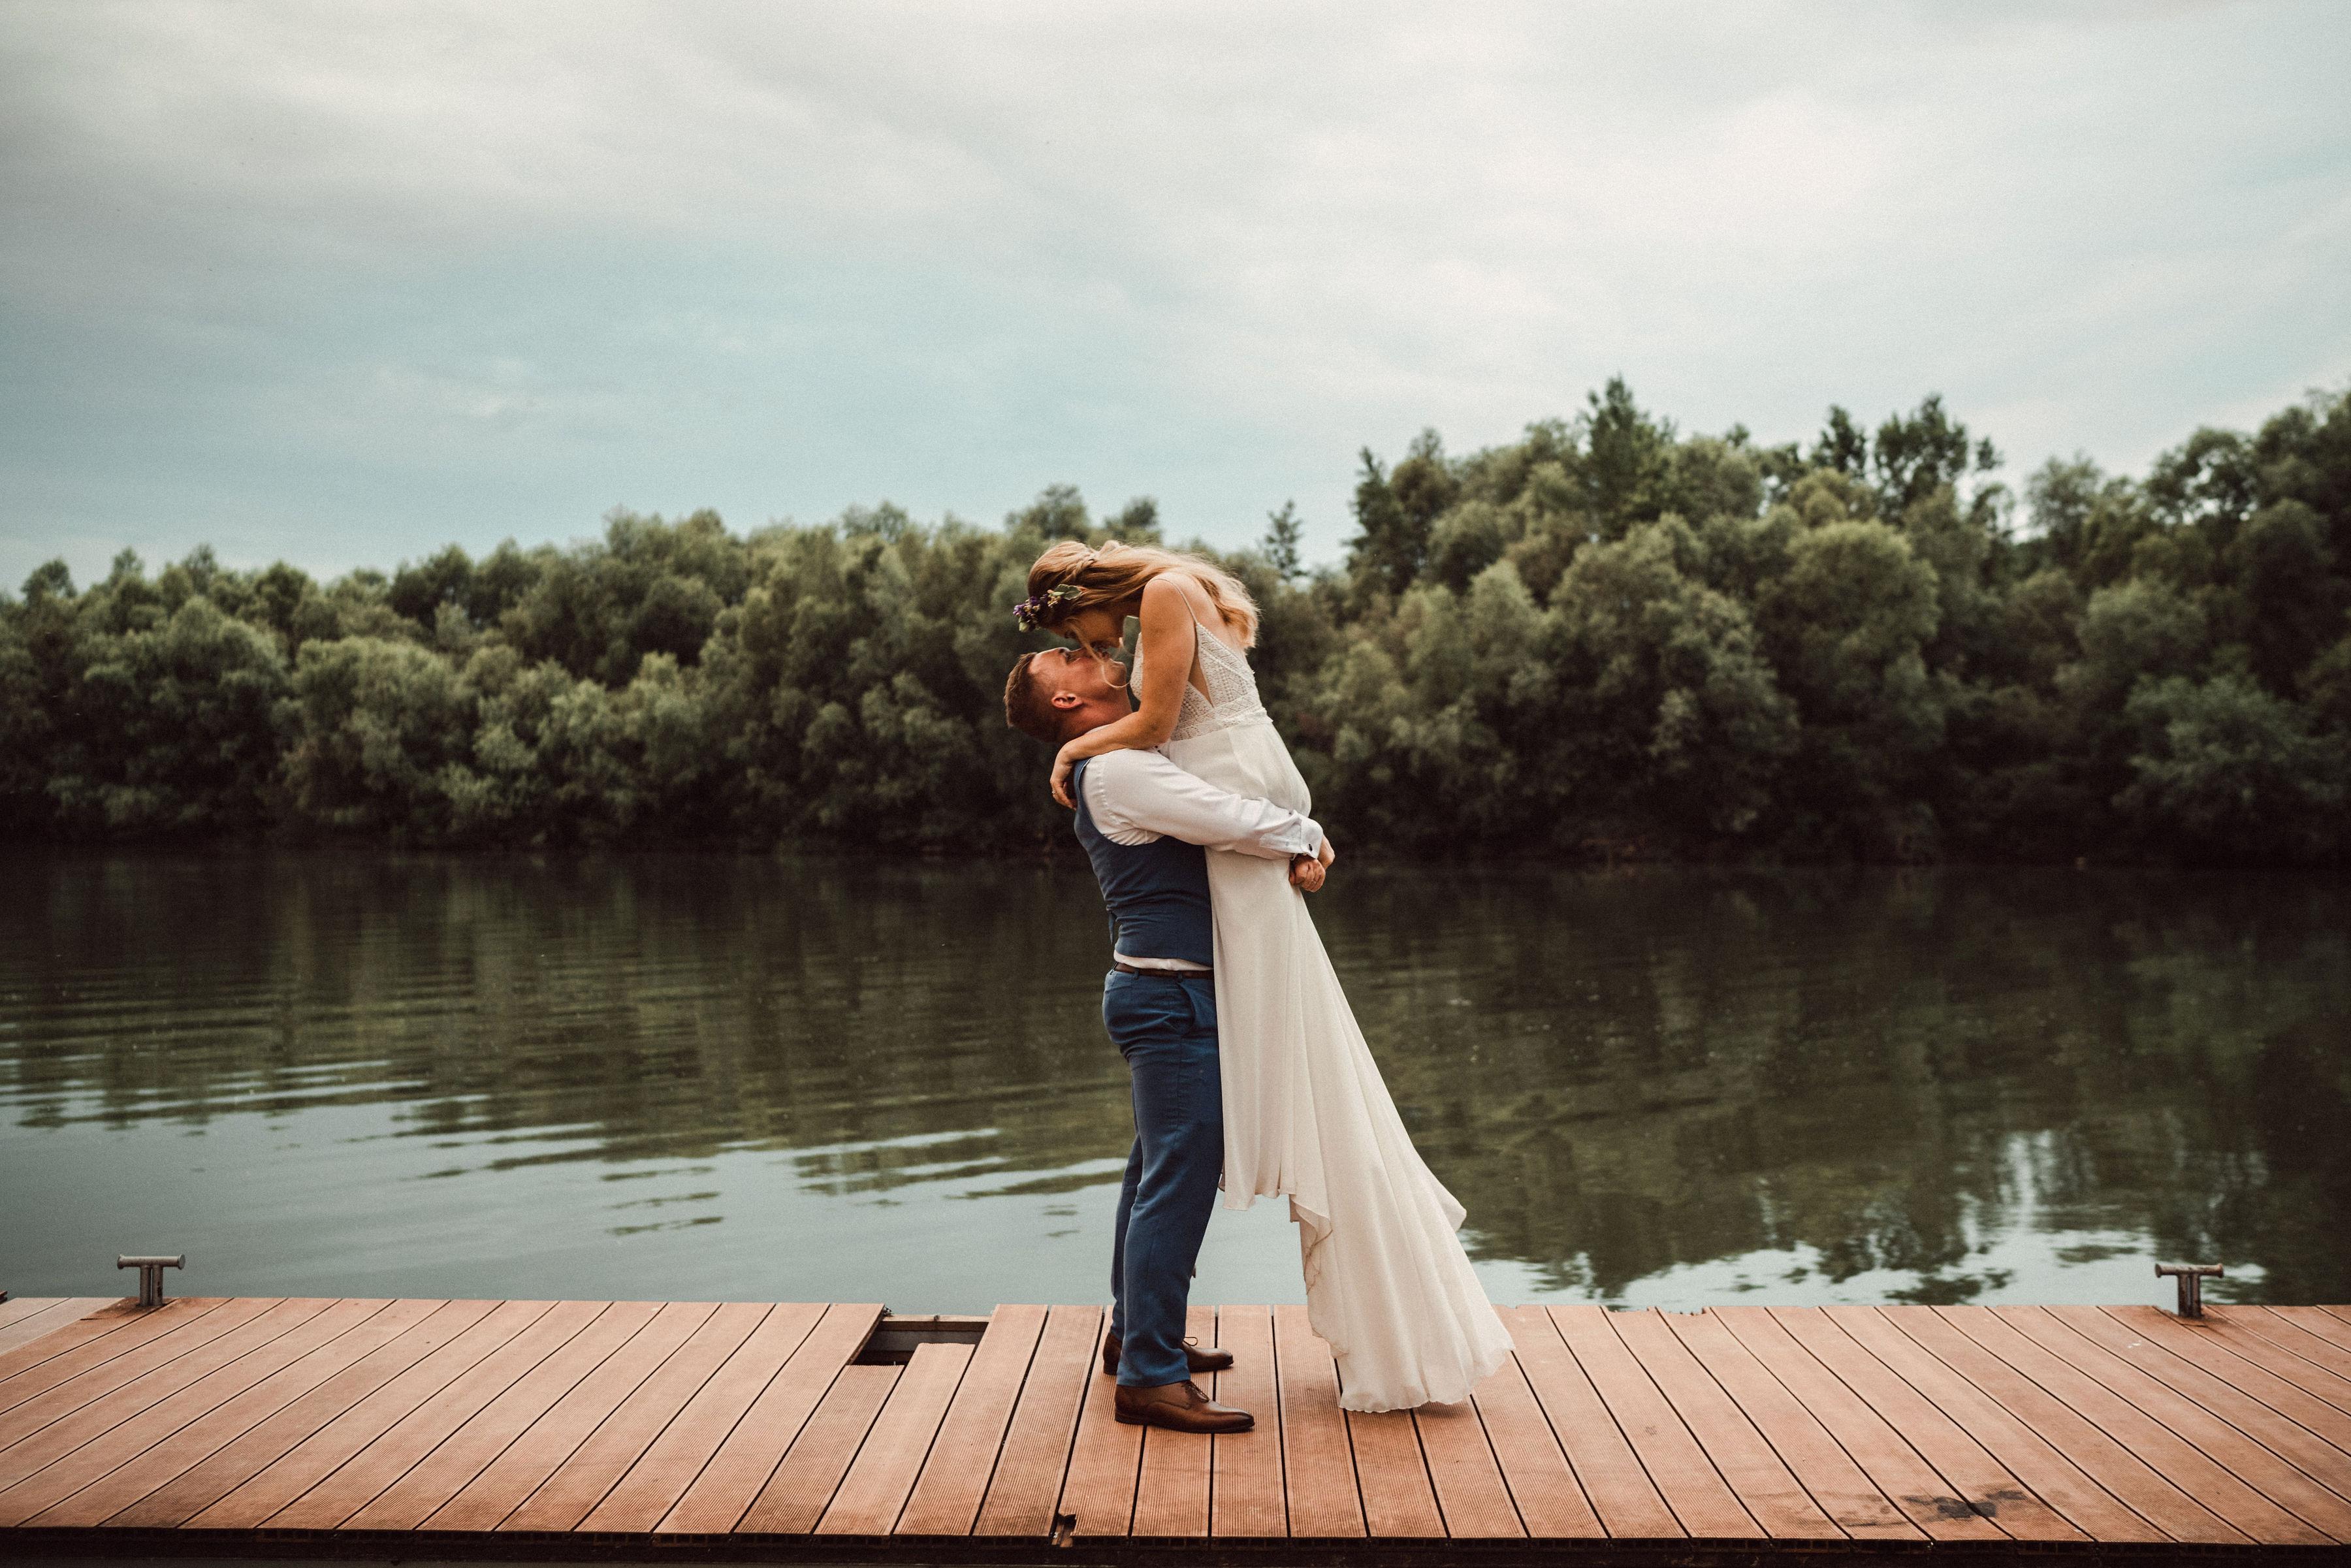 svadobny-fotograf-liptovjpg